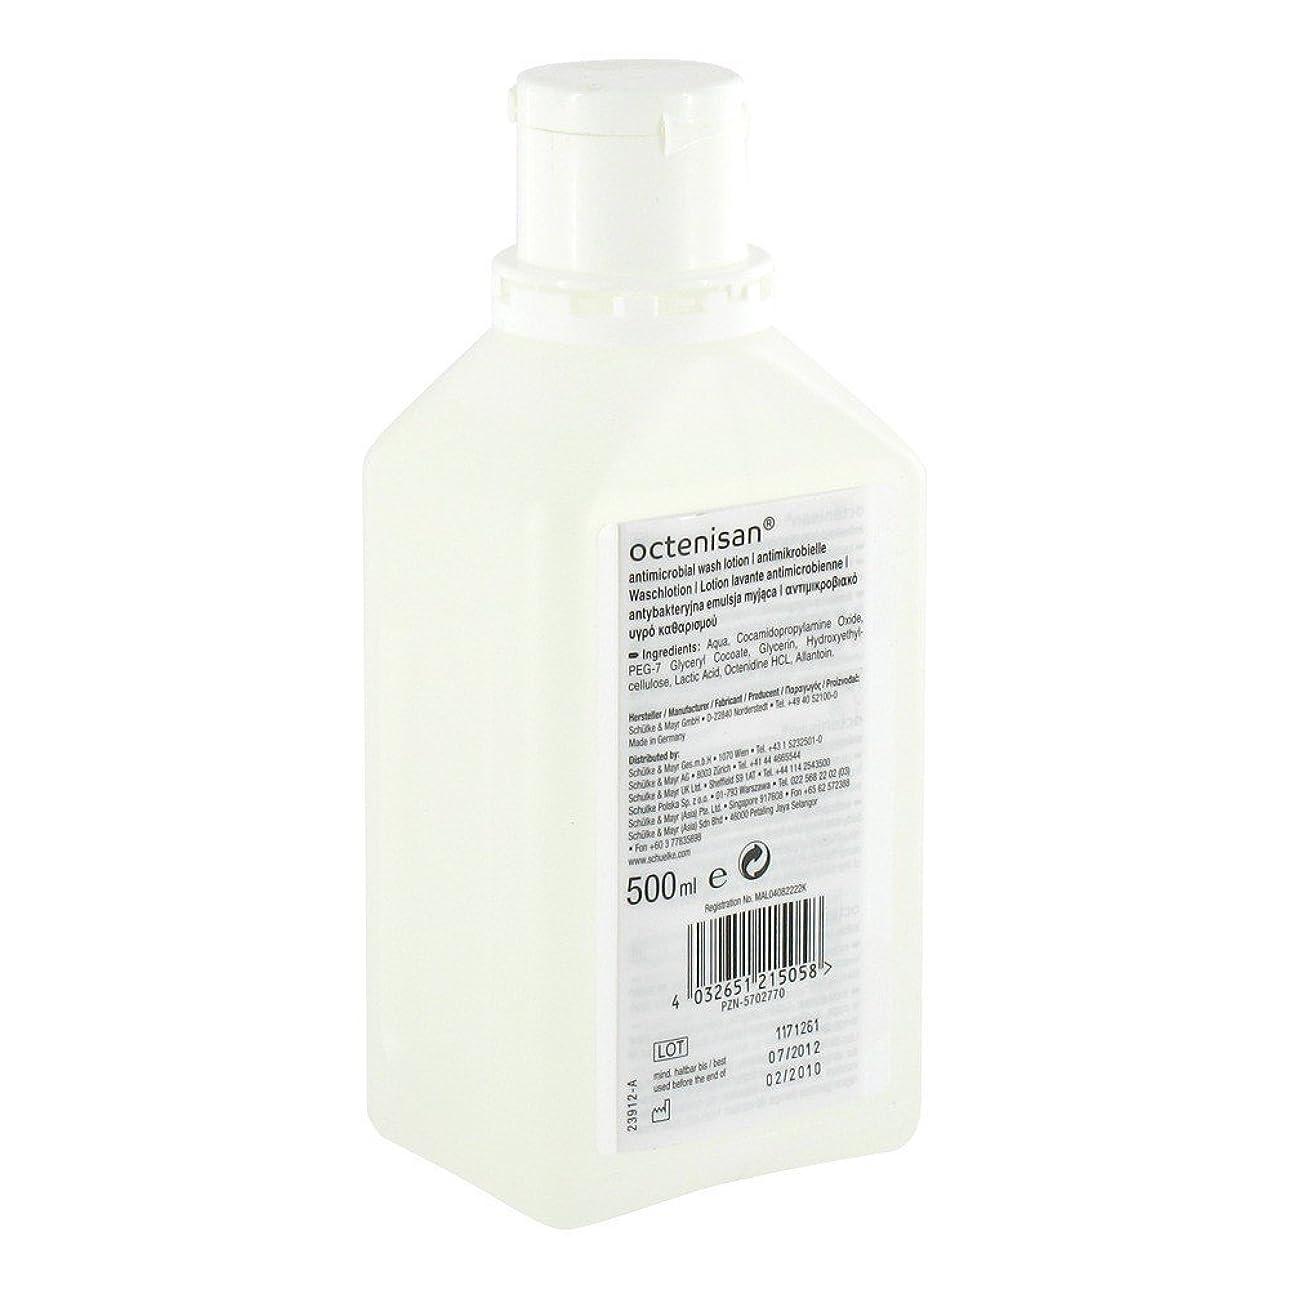 SCHULKE OCTENISAN抗菌洗浄ローション - 500ML